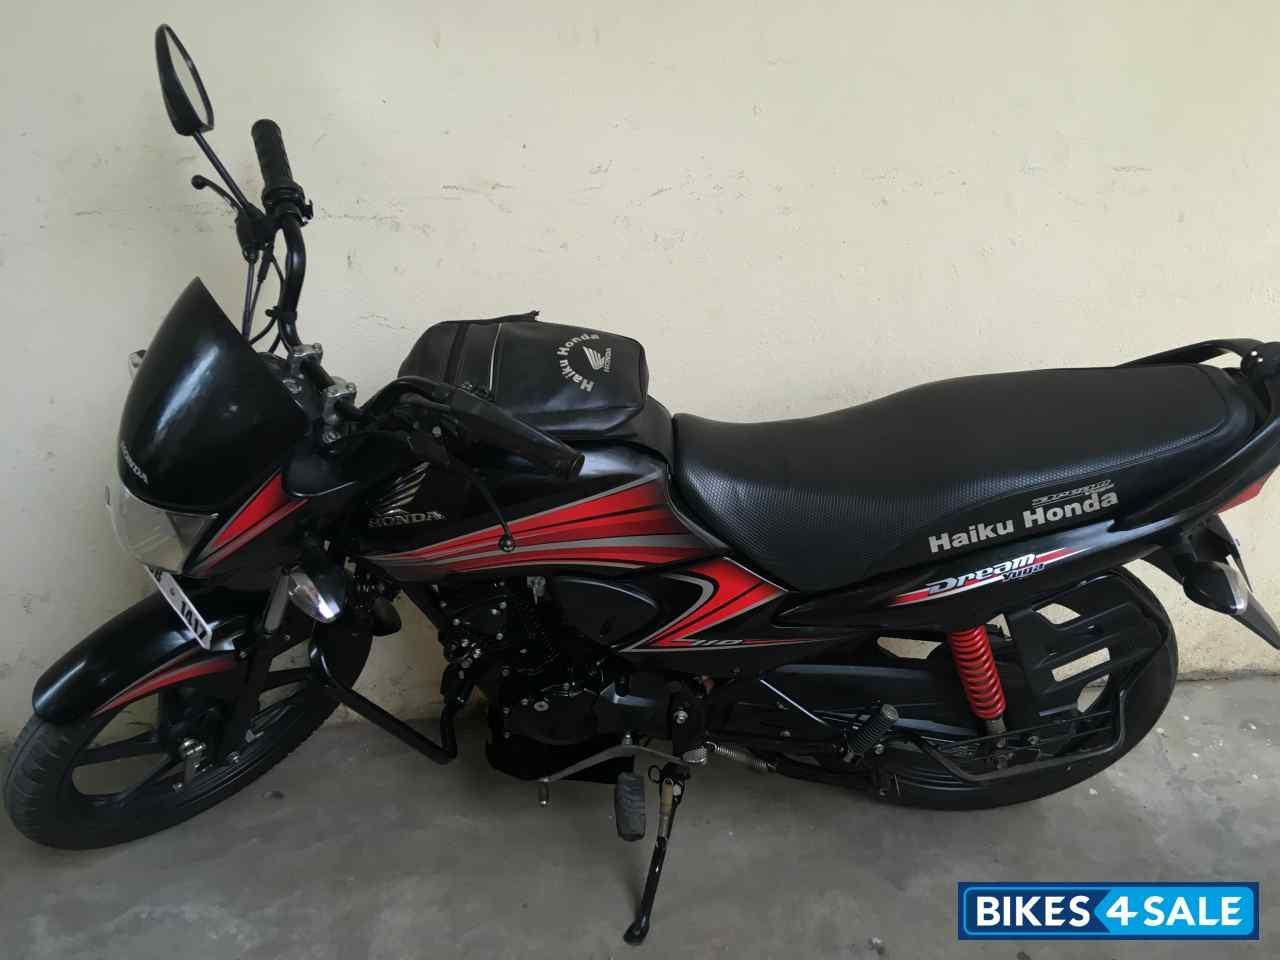 Used 2015 Model Honda Dream Yuga For Sale In Chennai Id 197004 Bikes4sale